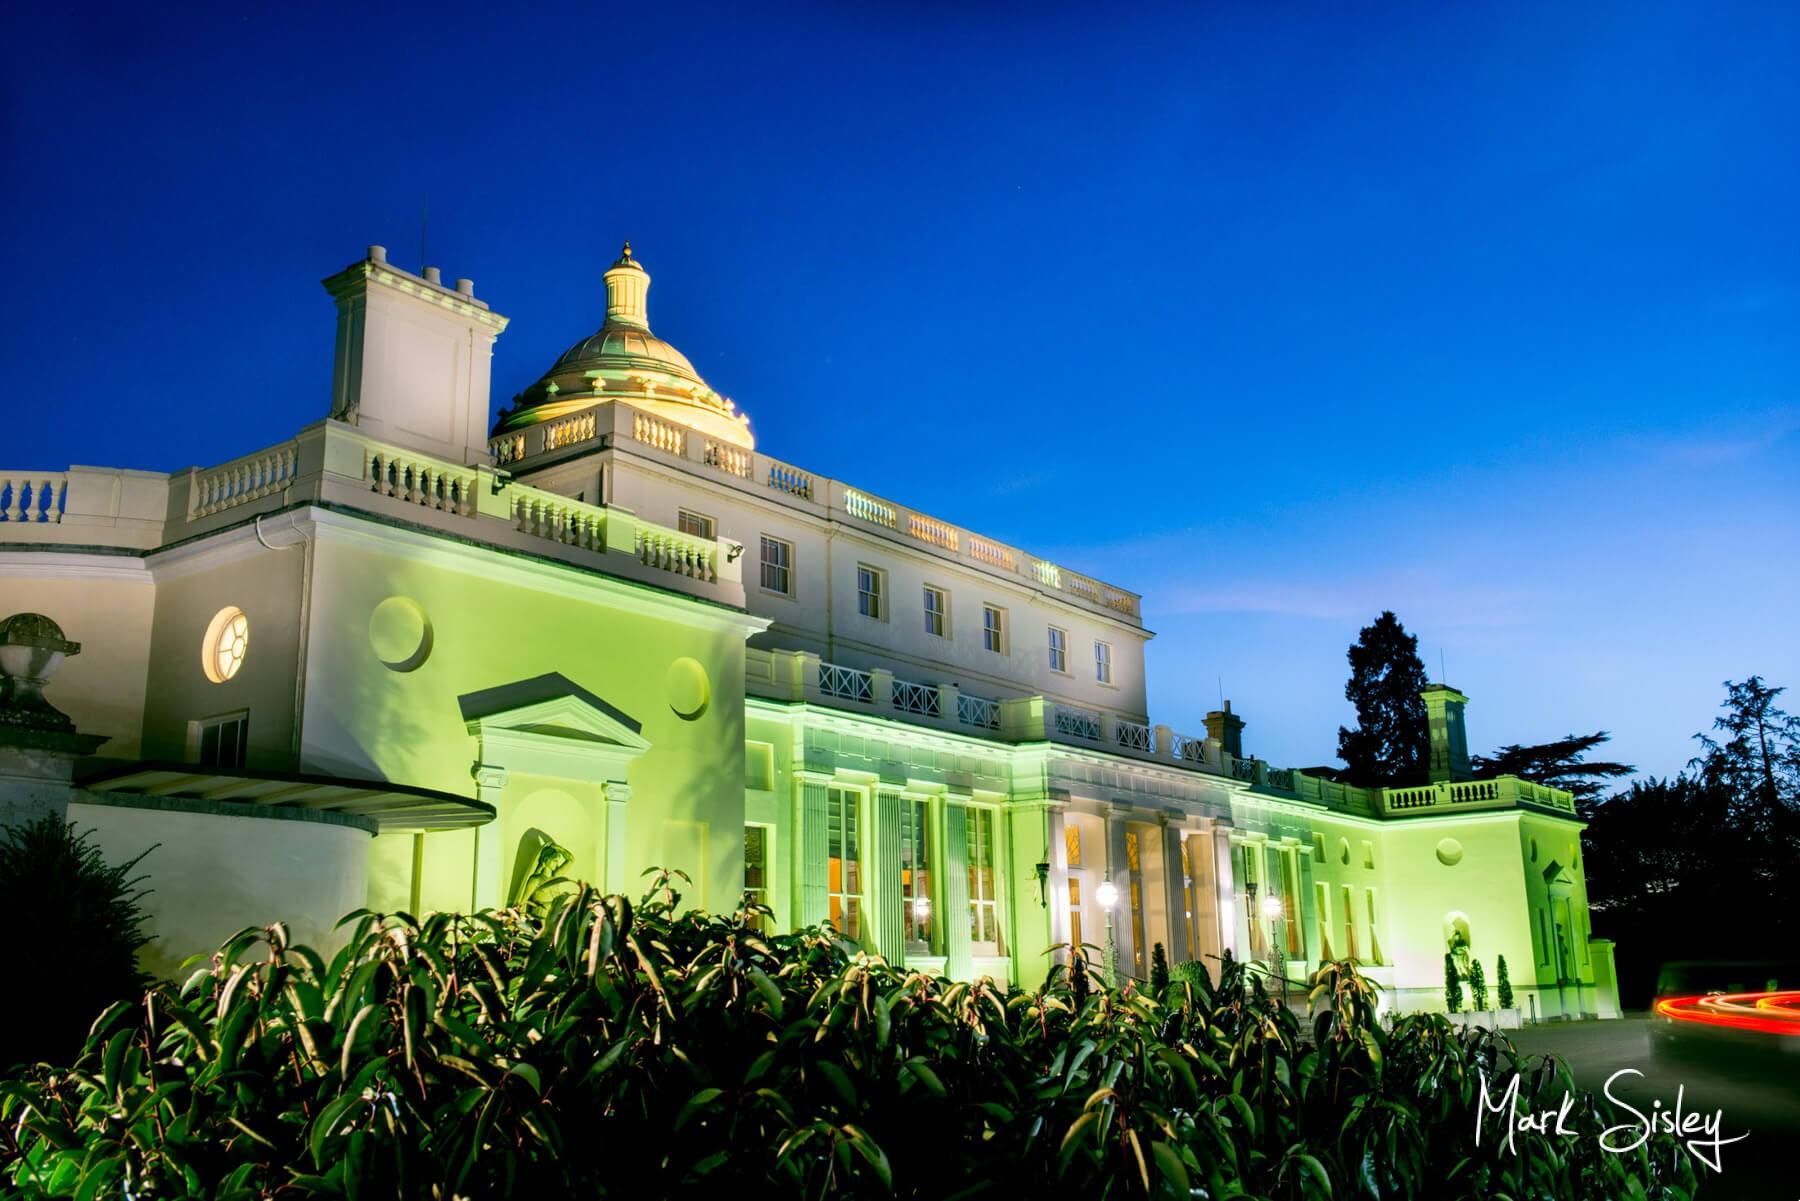 Buckinghamshire Wedding Photography - Stoke Park Hotel - twilight image with green uplighting